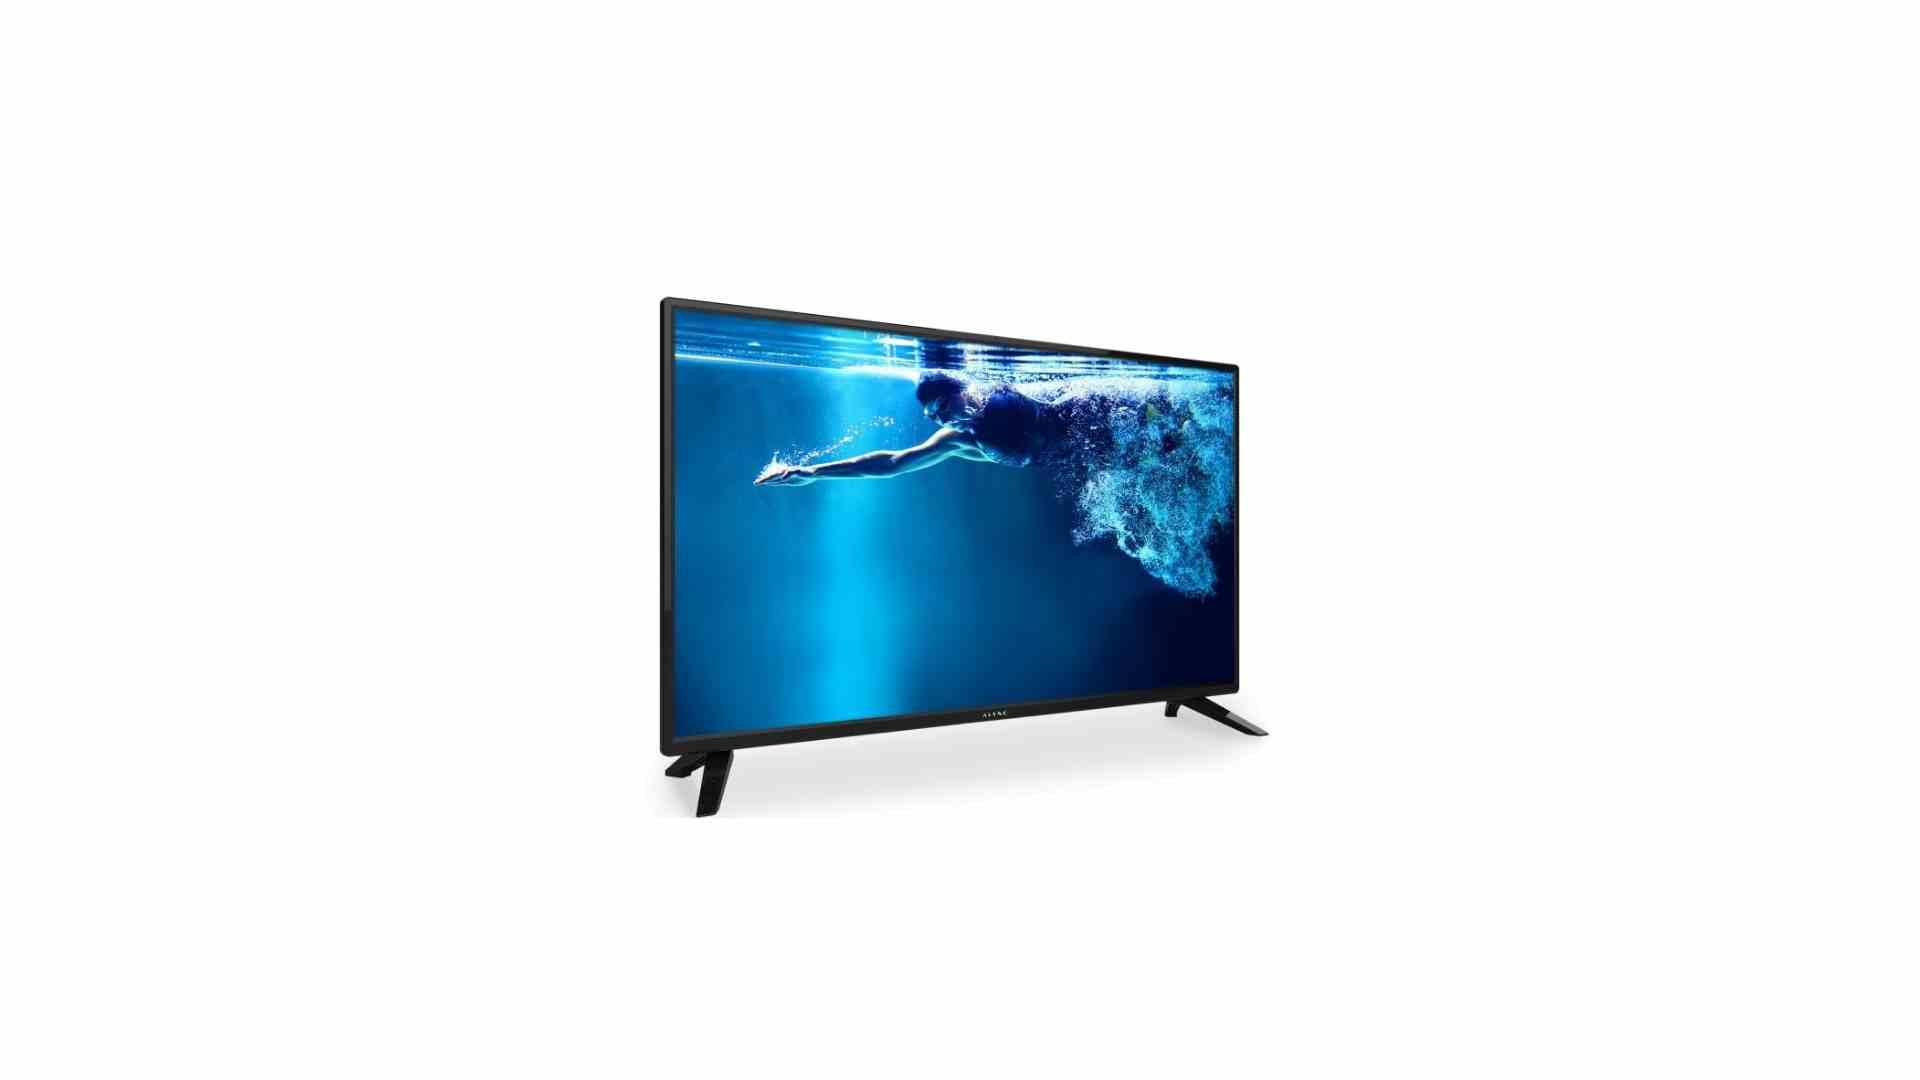 KIANO SLIM TV LED 32